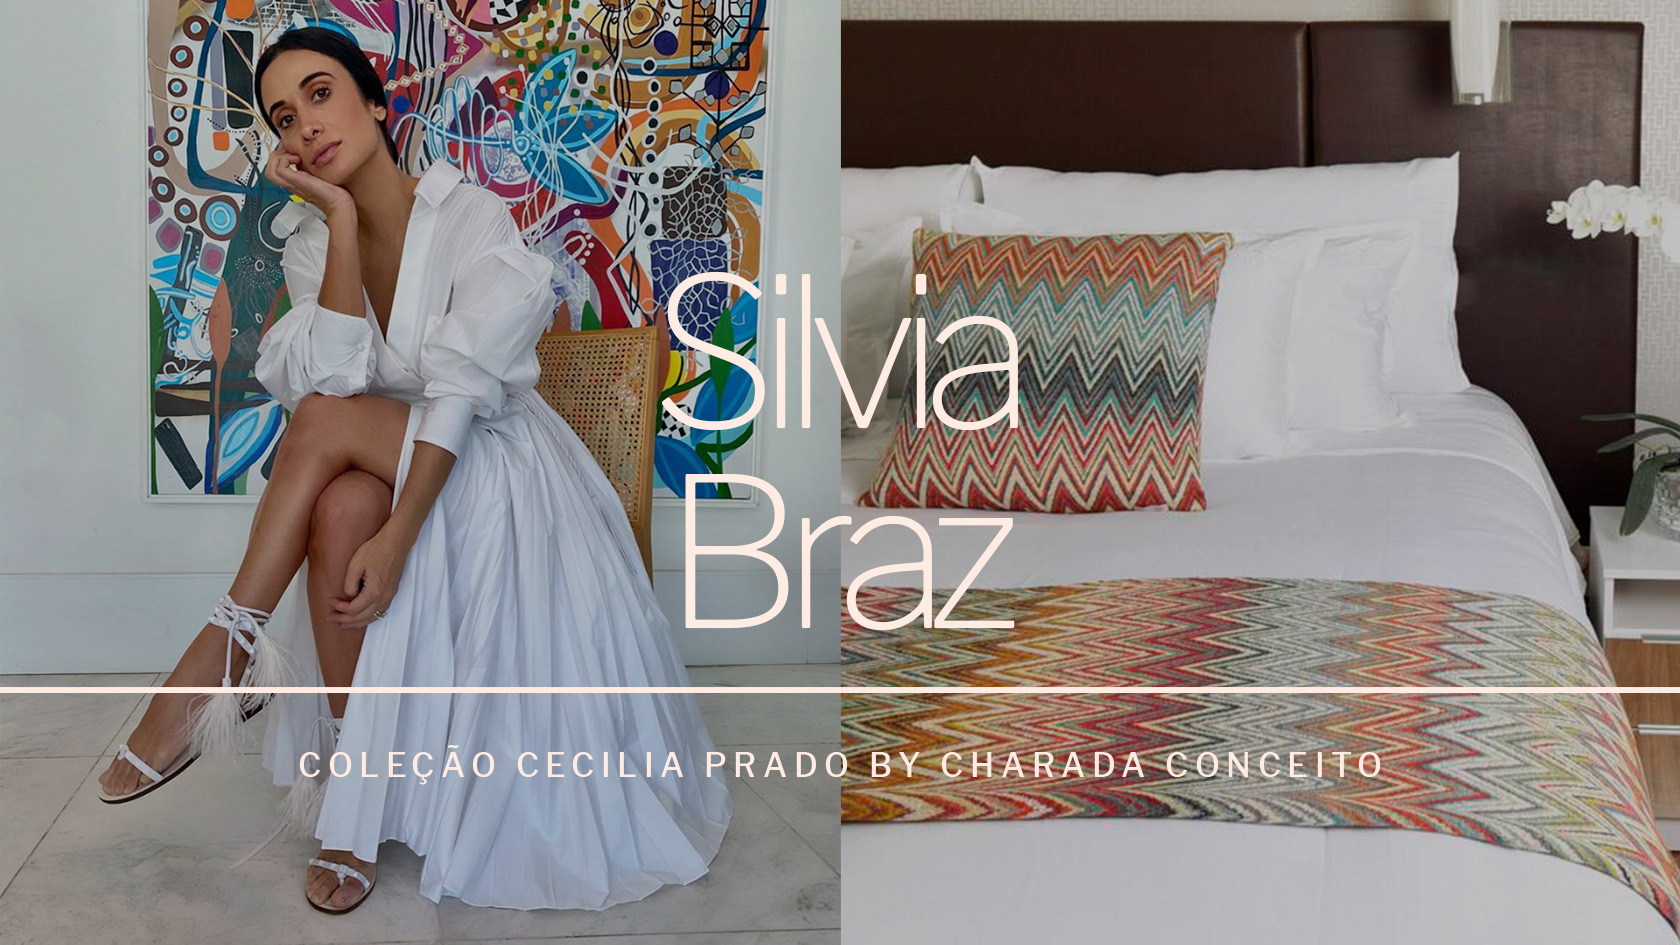 Banner - Silvia Braz